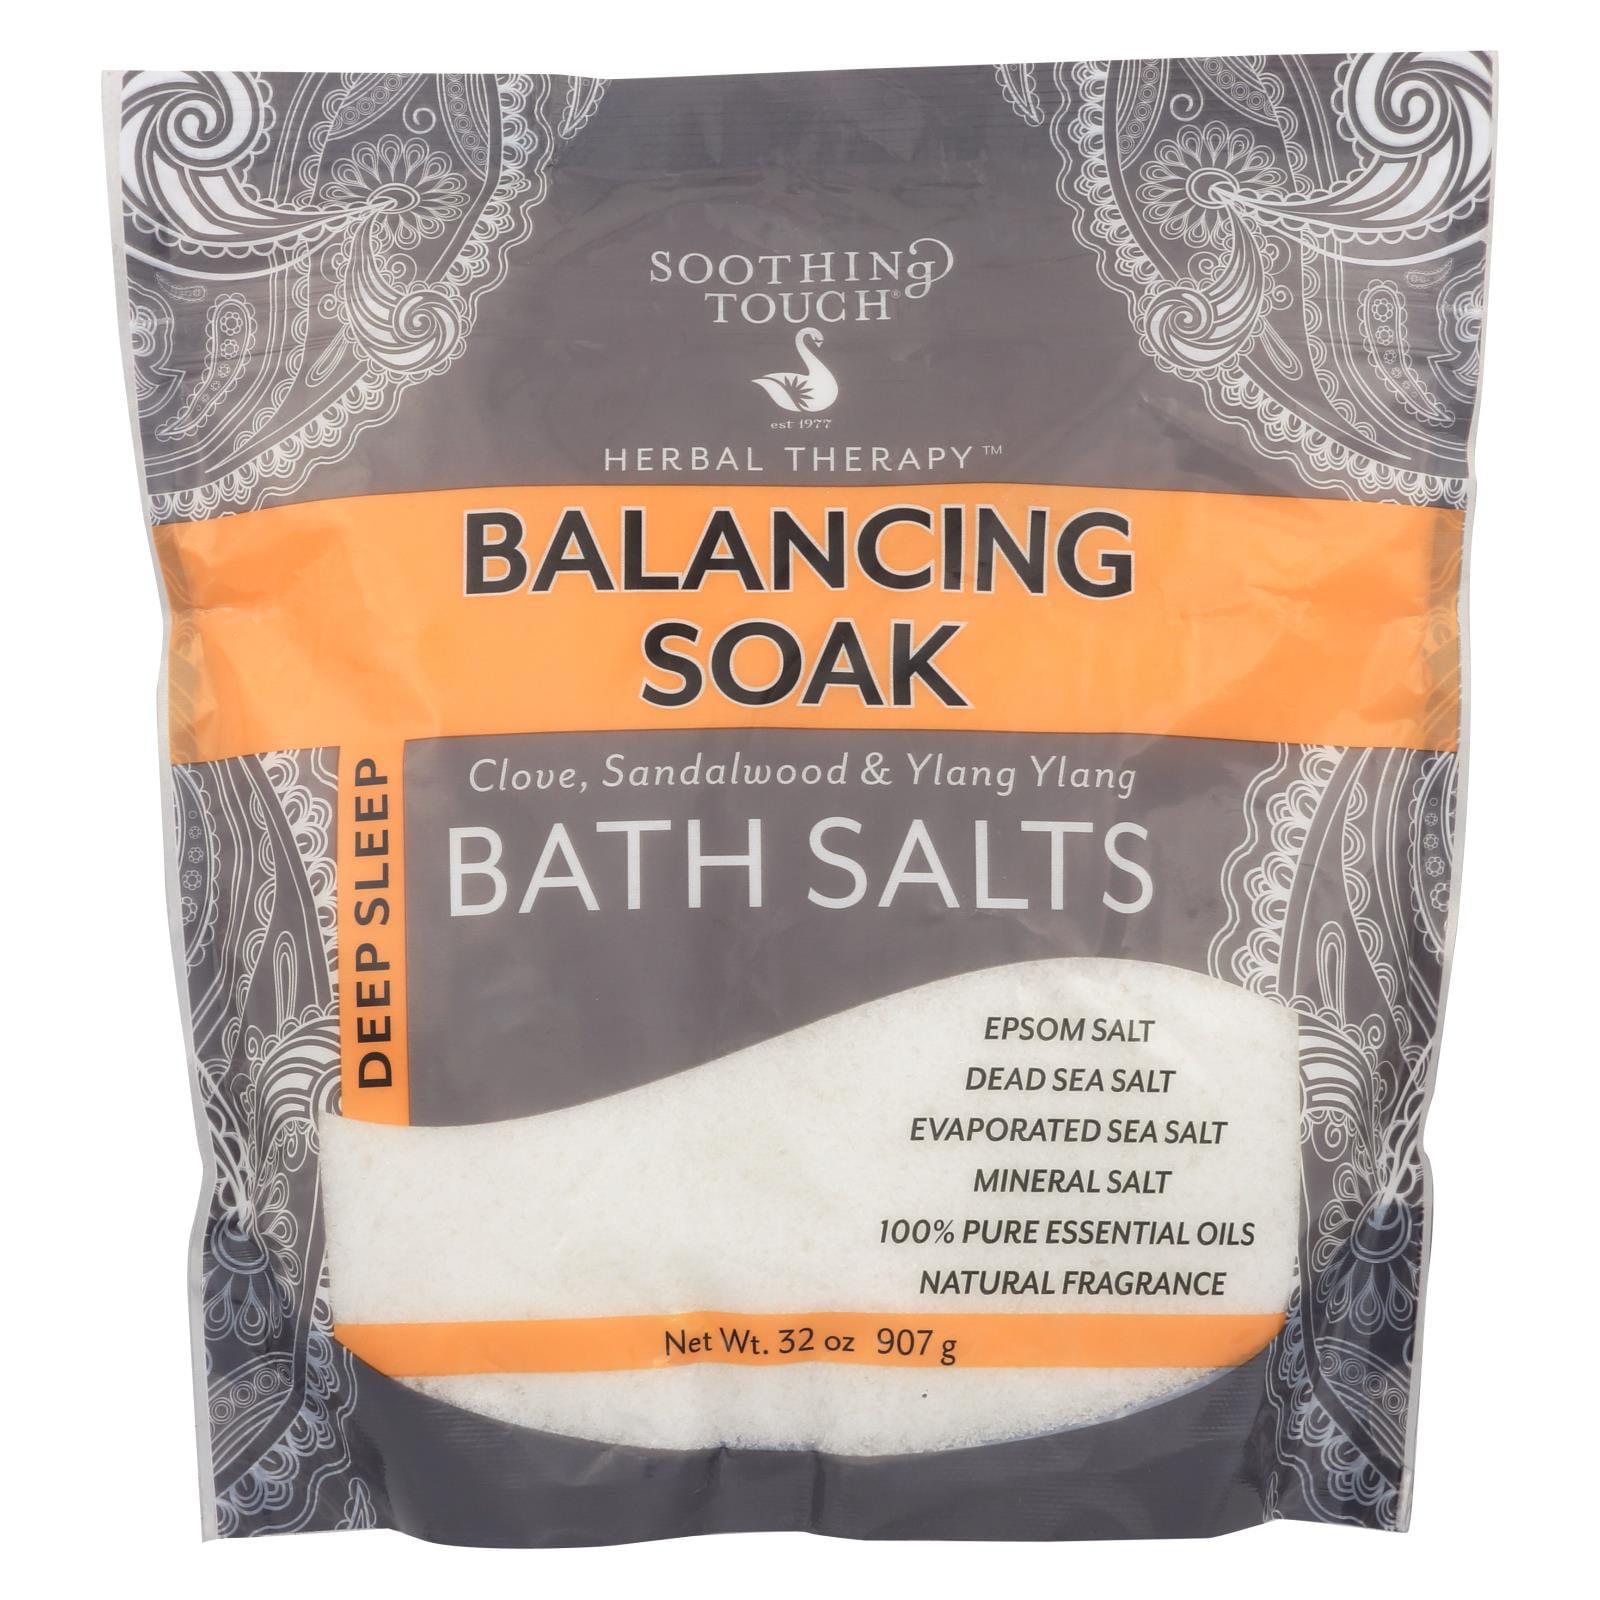 Soothing Touch Bath Salts - Balancing Soak - 32 oz